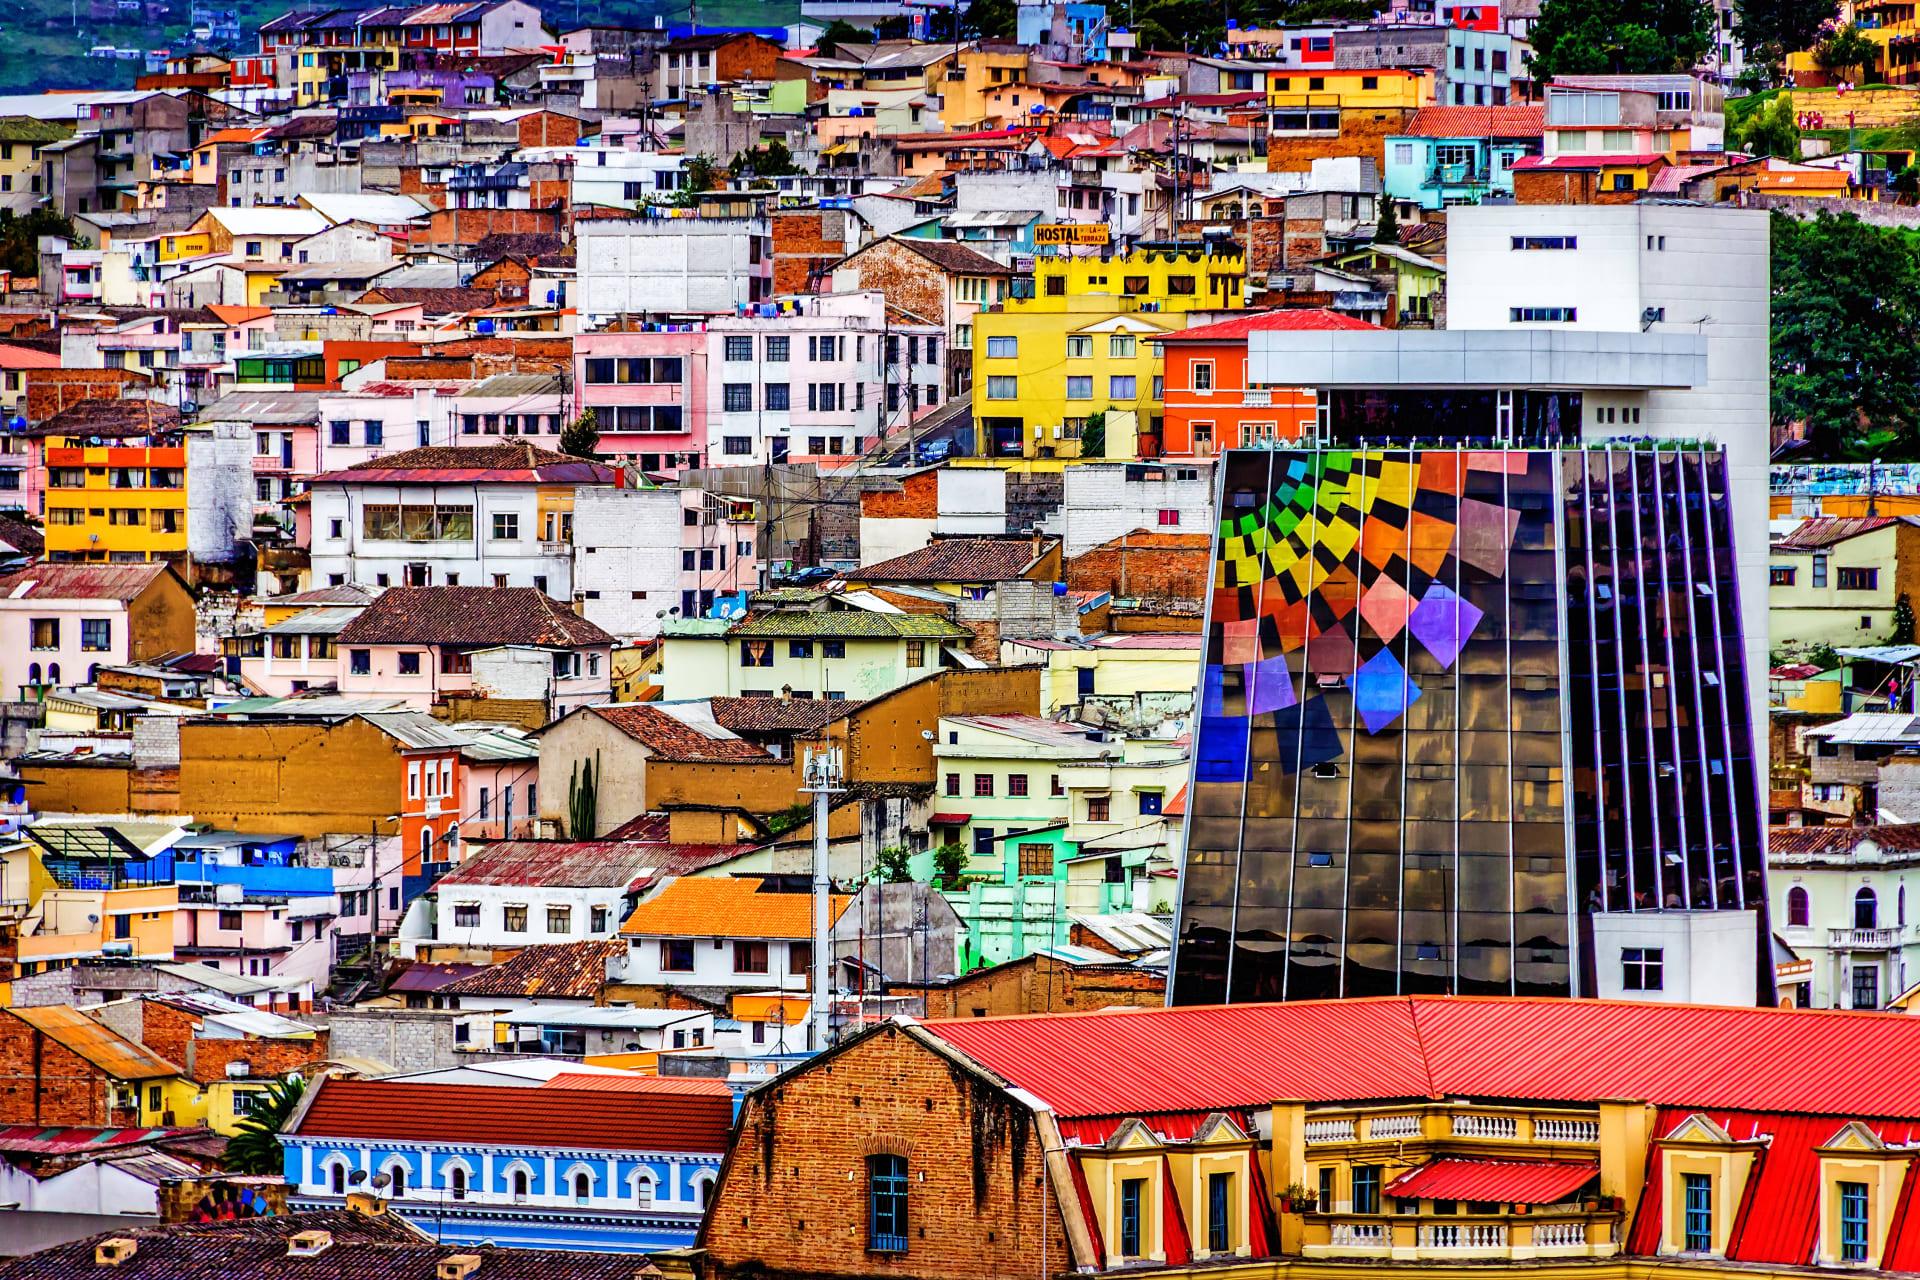 Quito - Street Art & Graffiti Walking Tour in Quito